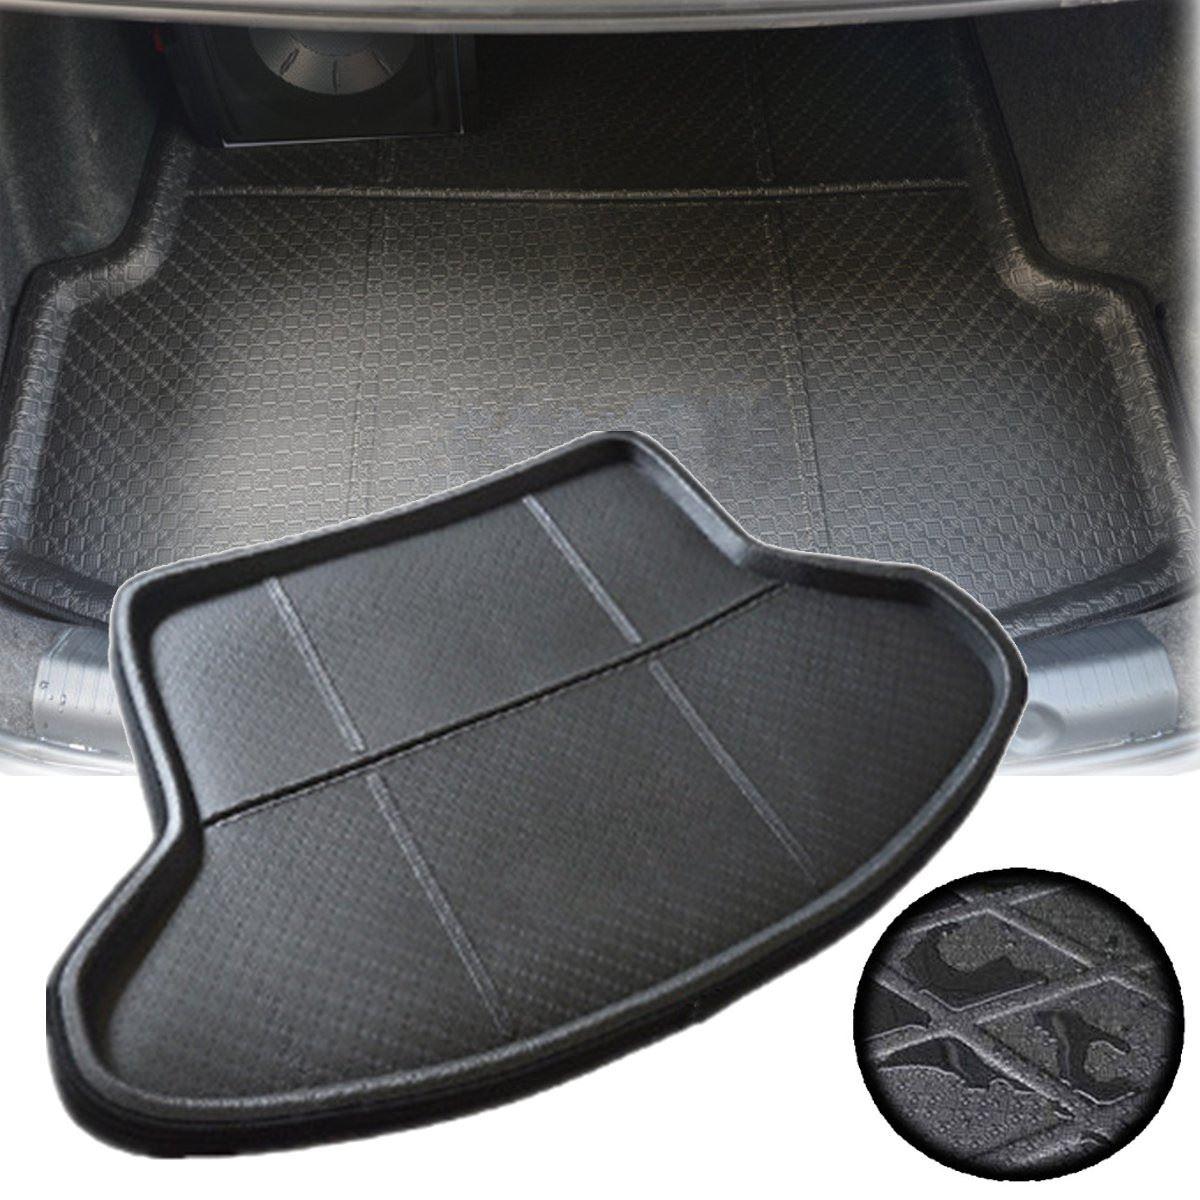 Coche tronco trasero cargo liner alfombra amortiguador impermeable Mat trasero para Toyota Prius 2008-2012 piso de protección esteras